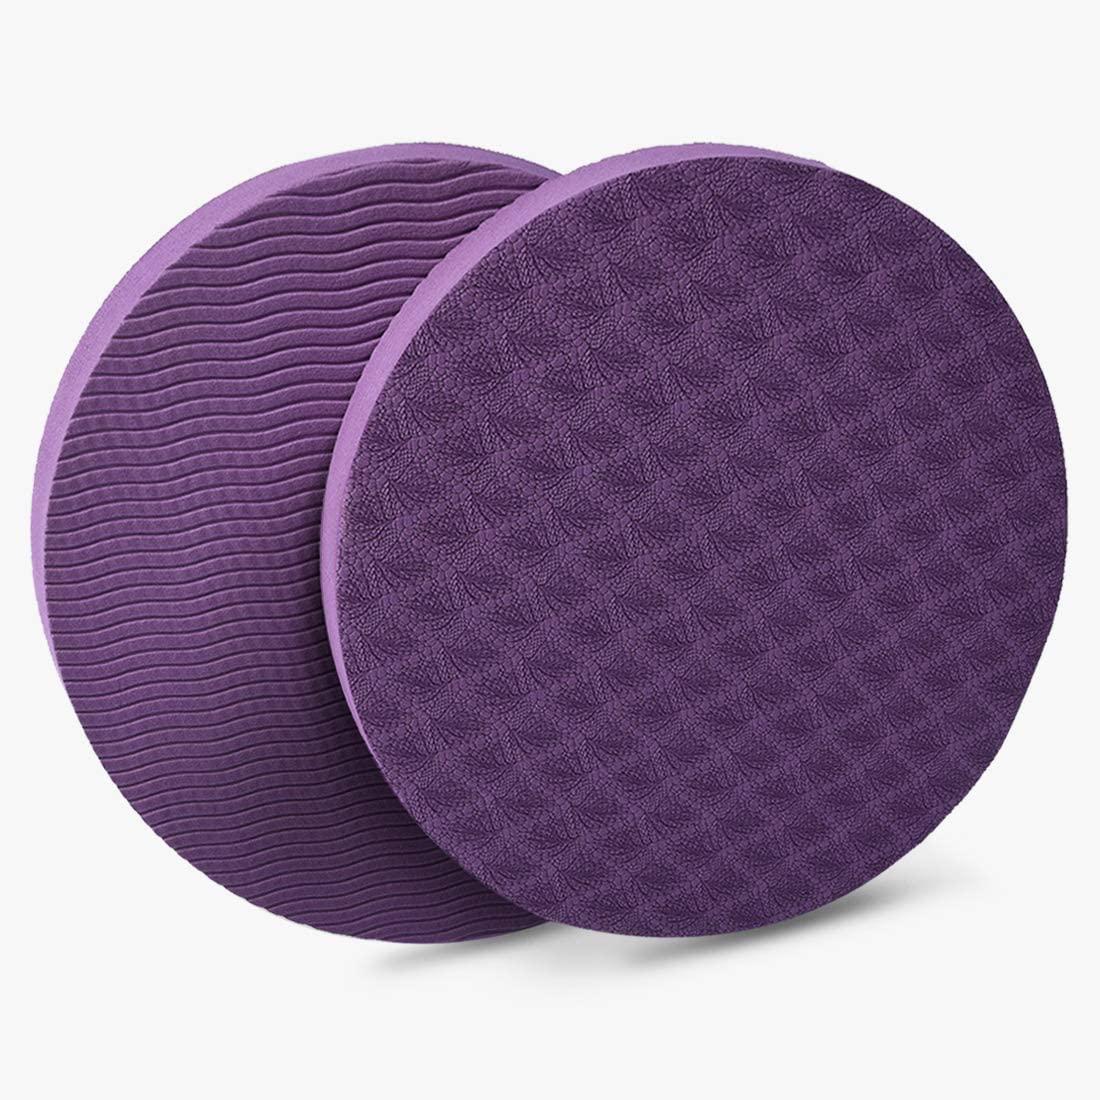 GoYonder Yoga Knee Pads, Portable Comfortable Knee Cushion High Density Non Slip Knee Mats for Yoga Pilates Floor Exercises 2 Pack